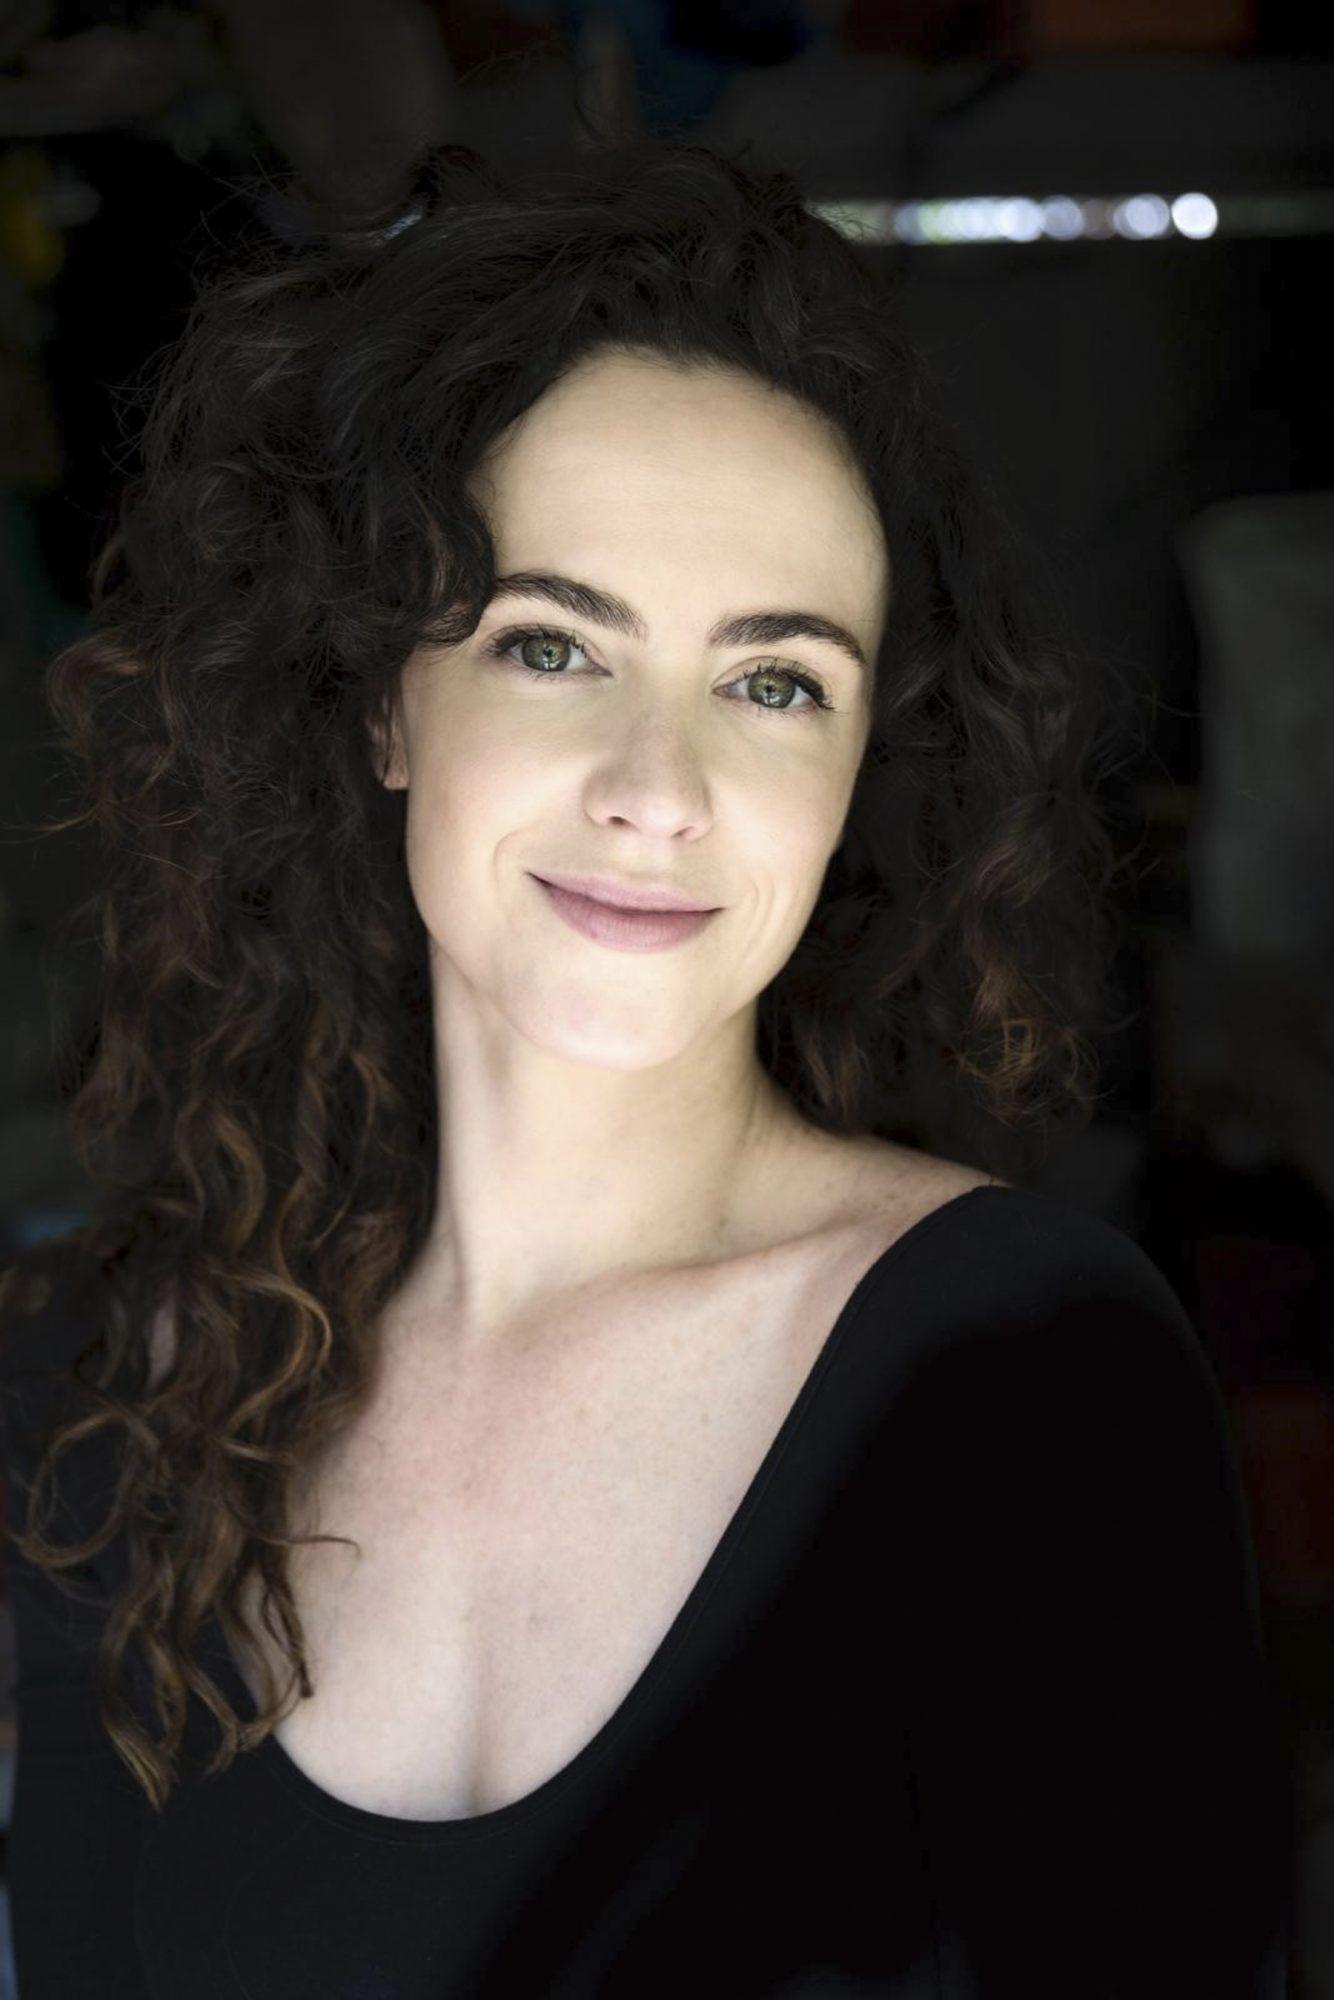 Amy Manson - Headshot - PC Rich Hardcastle